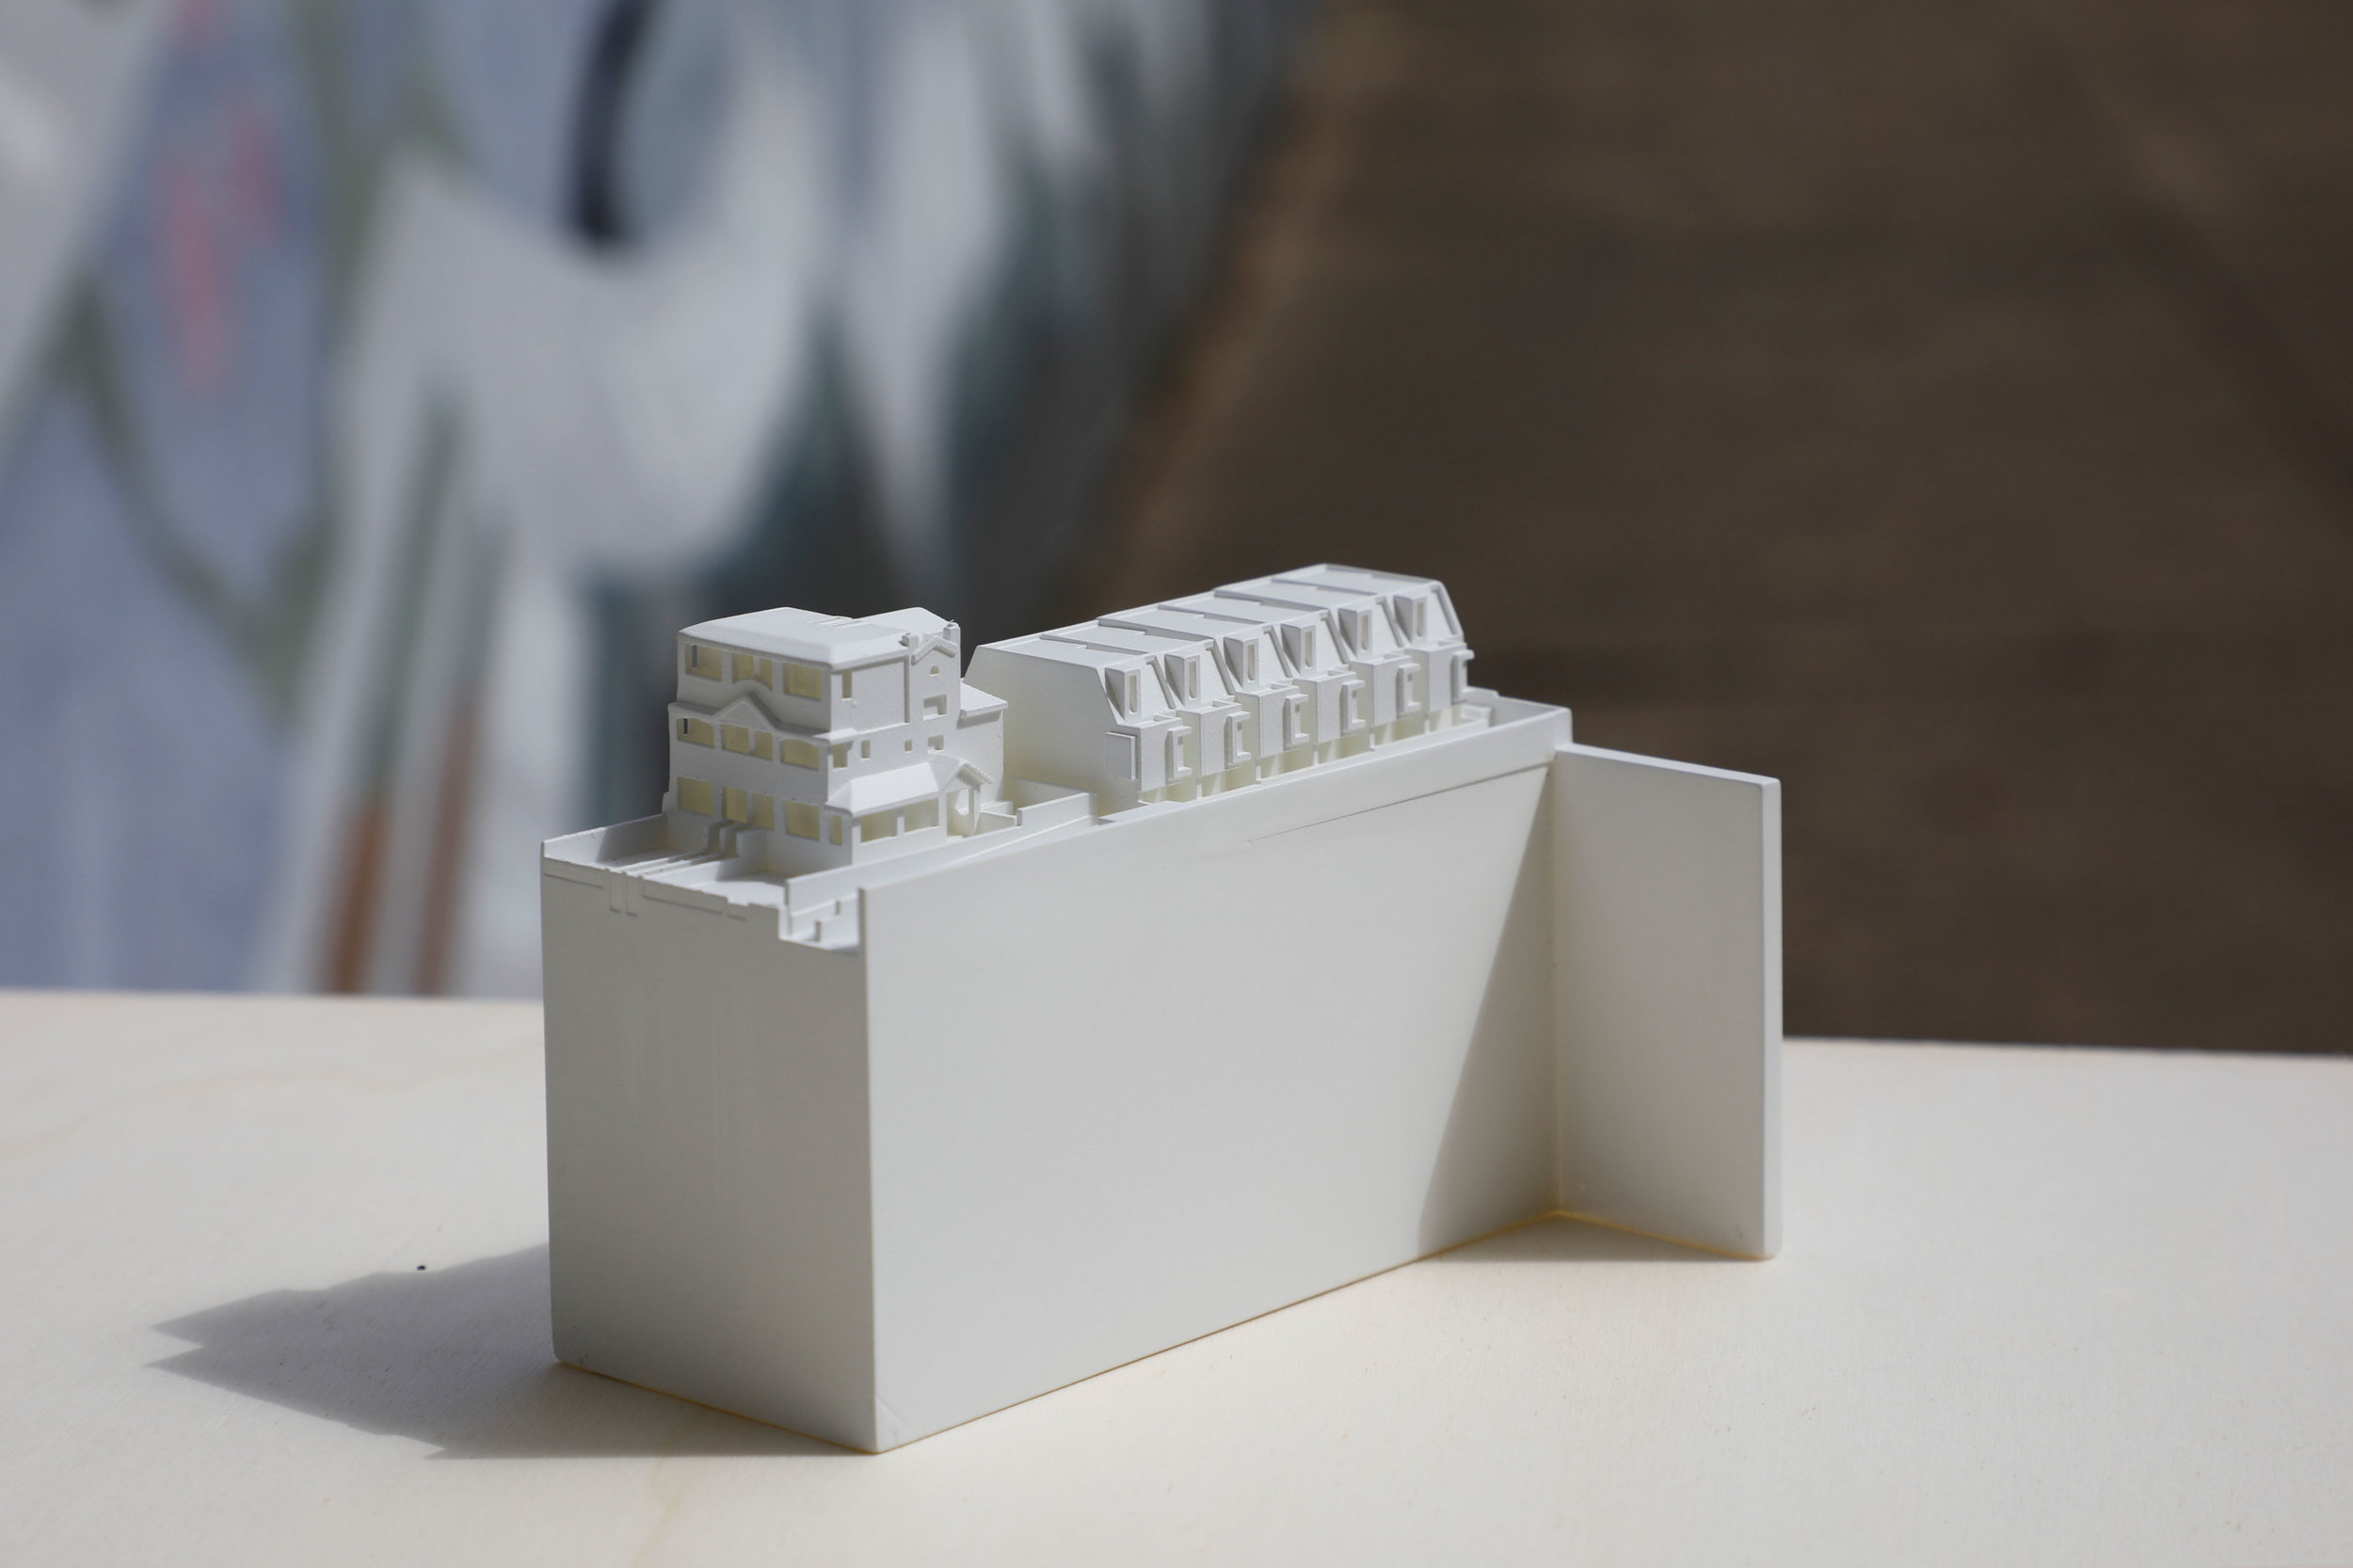 DA_Architecture_sydney_cnc_solid_timber_make_models_topography_laser_cutting-09 - Copy.jpg